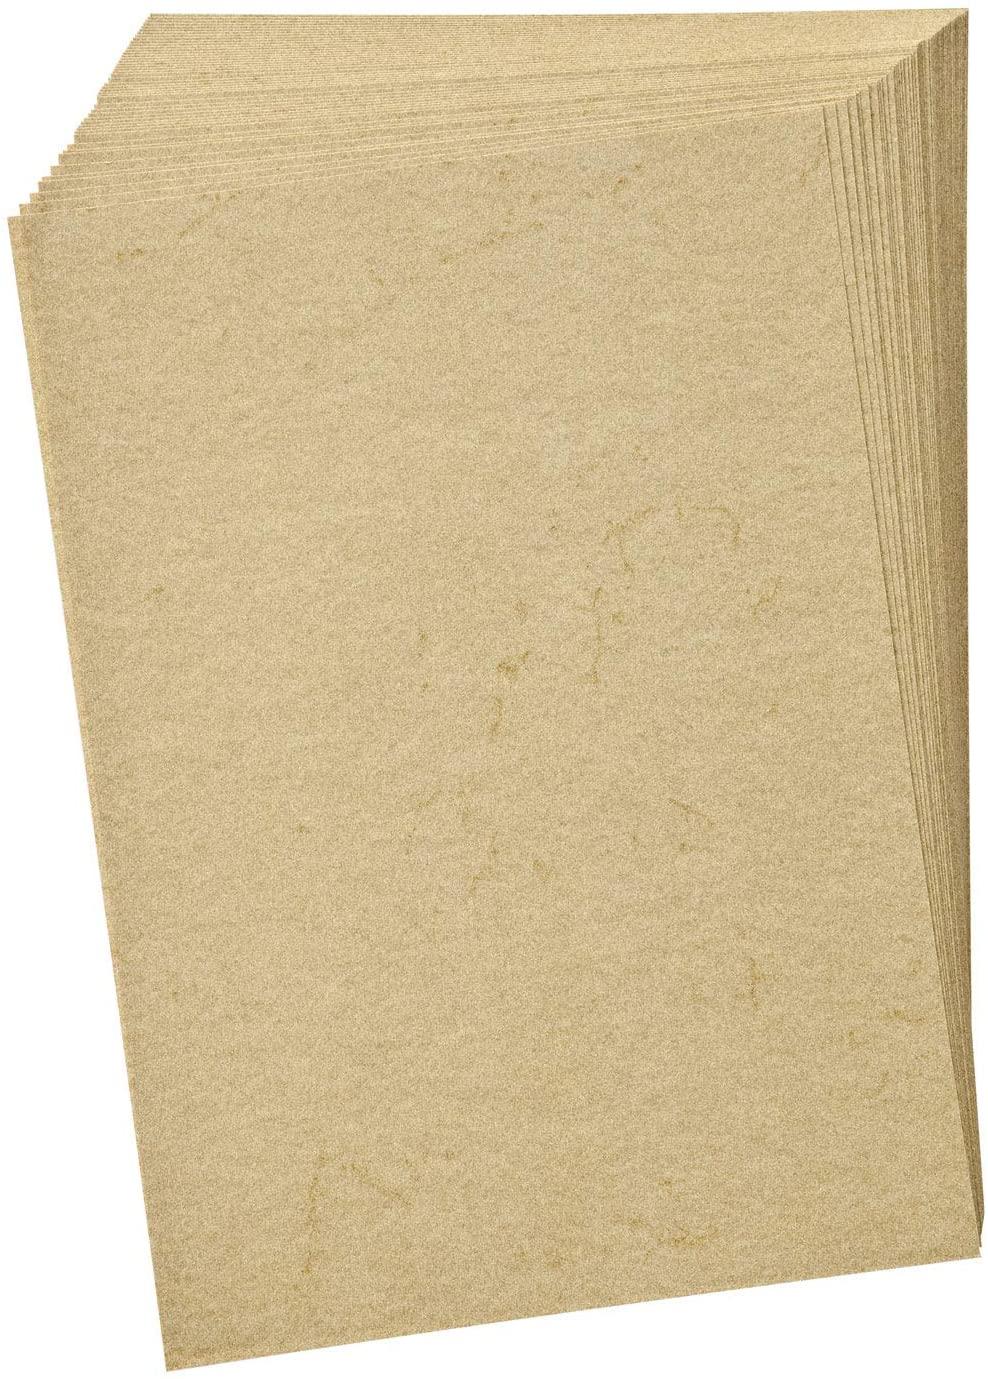 folia 950410 - Elefantenhaut, Urkundenpapier, 50 Blatt, 110 g/qm, DIN A4, chamois - elegantes Papier